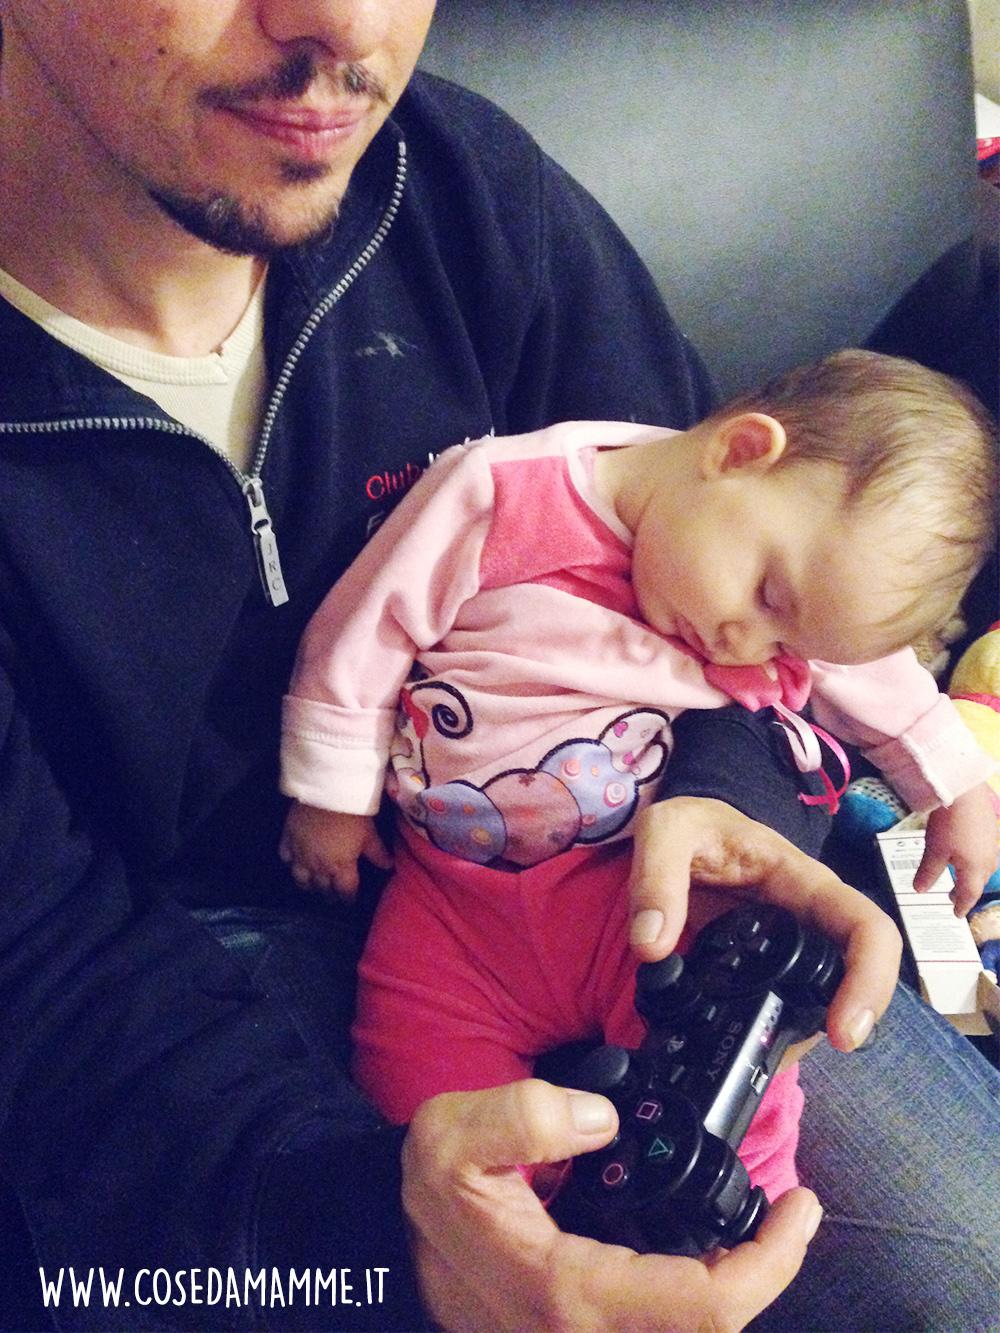 orly play alyssa dorme